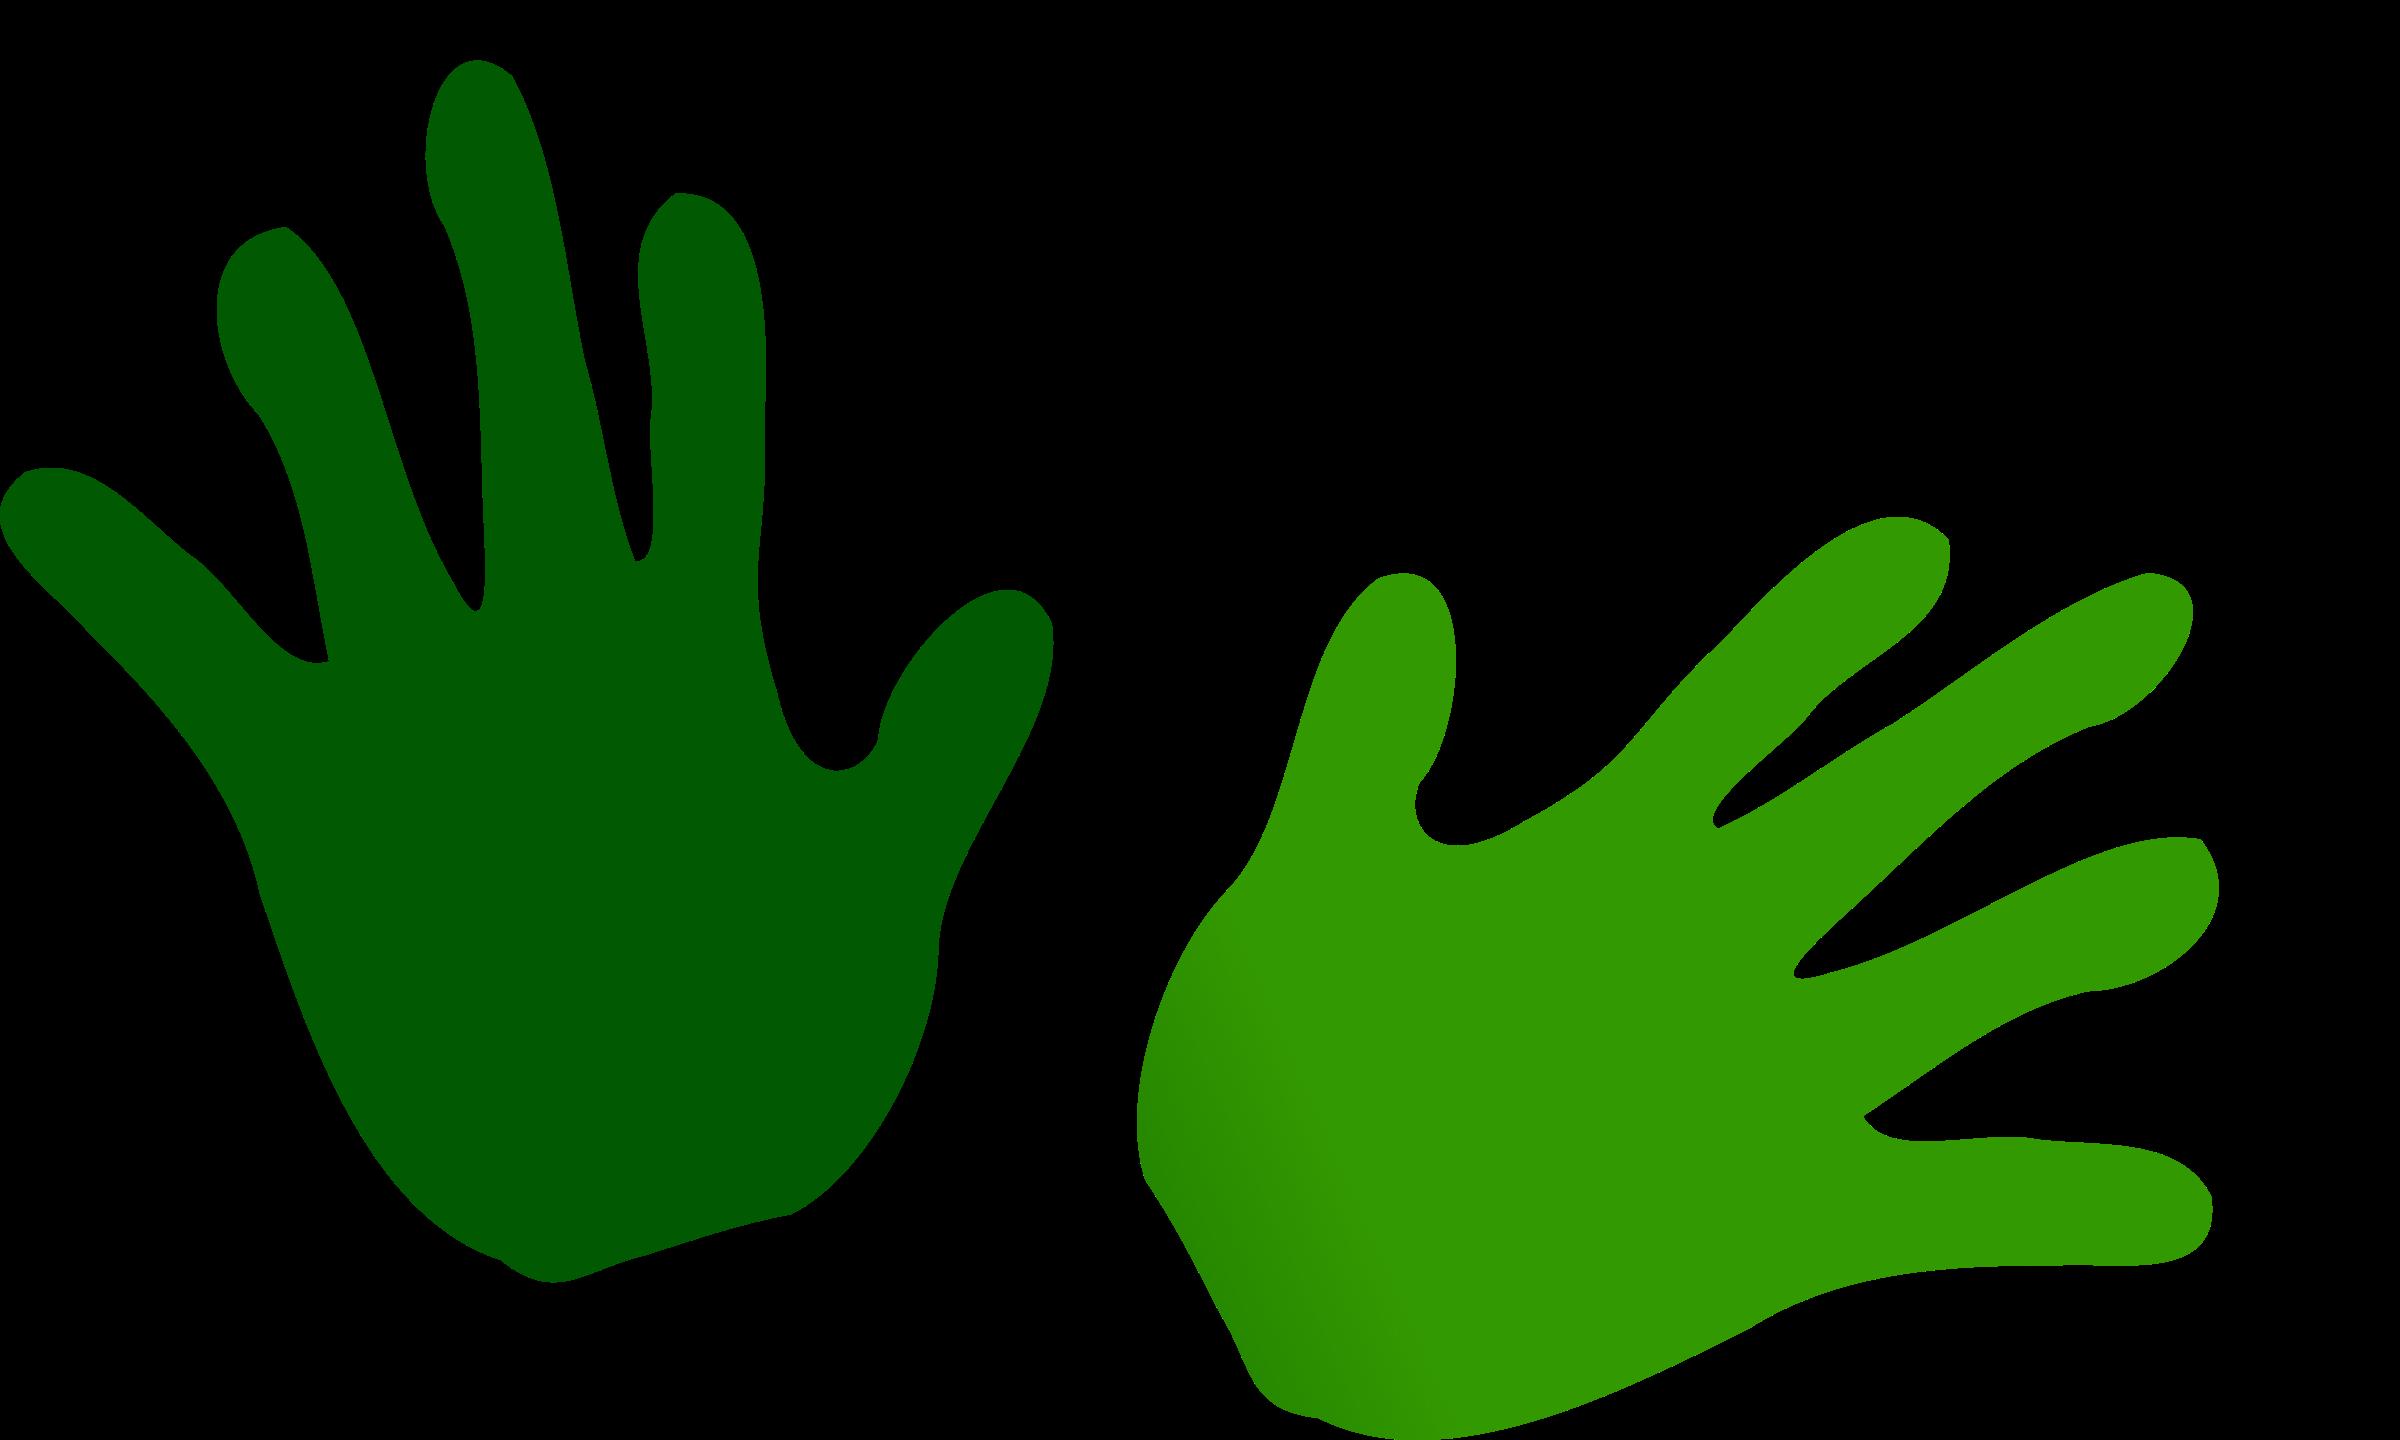 Green big image png. Hands clipart open